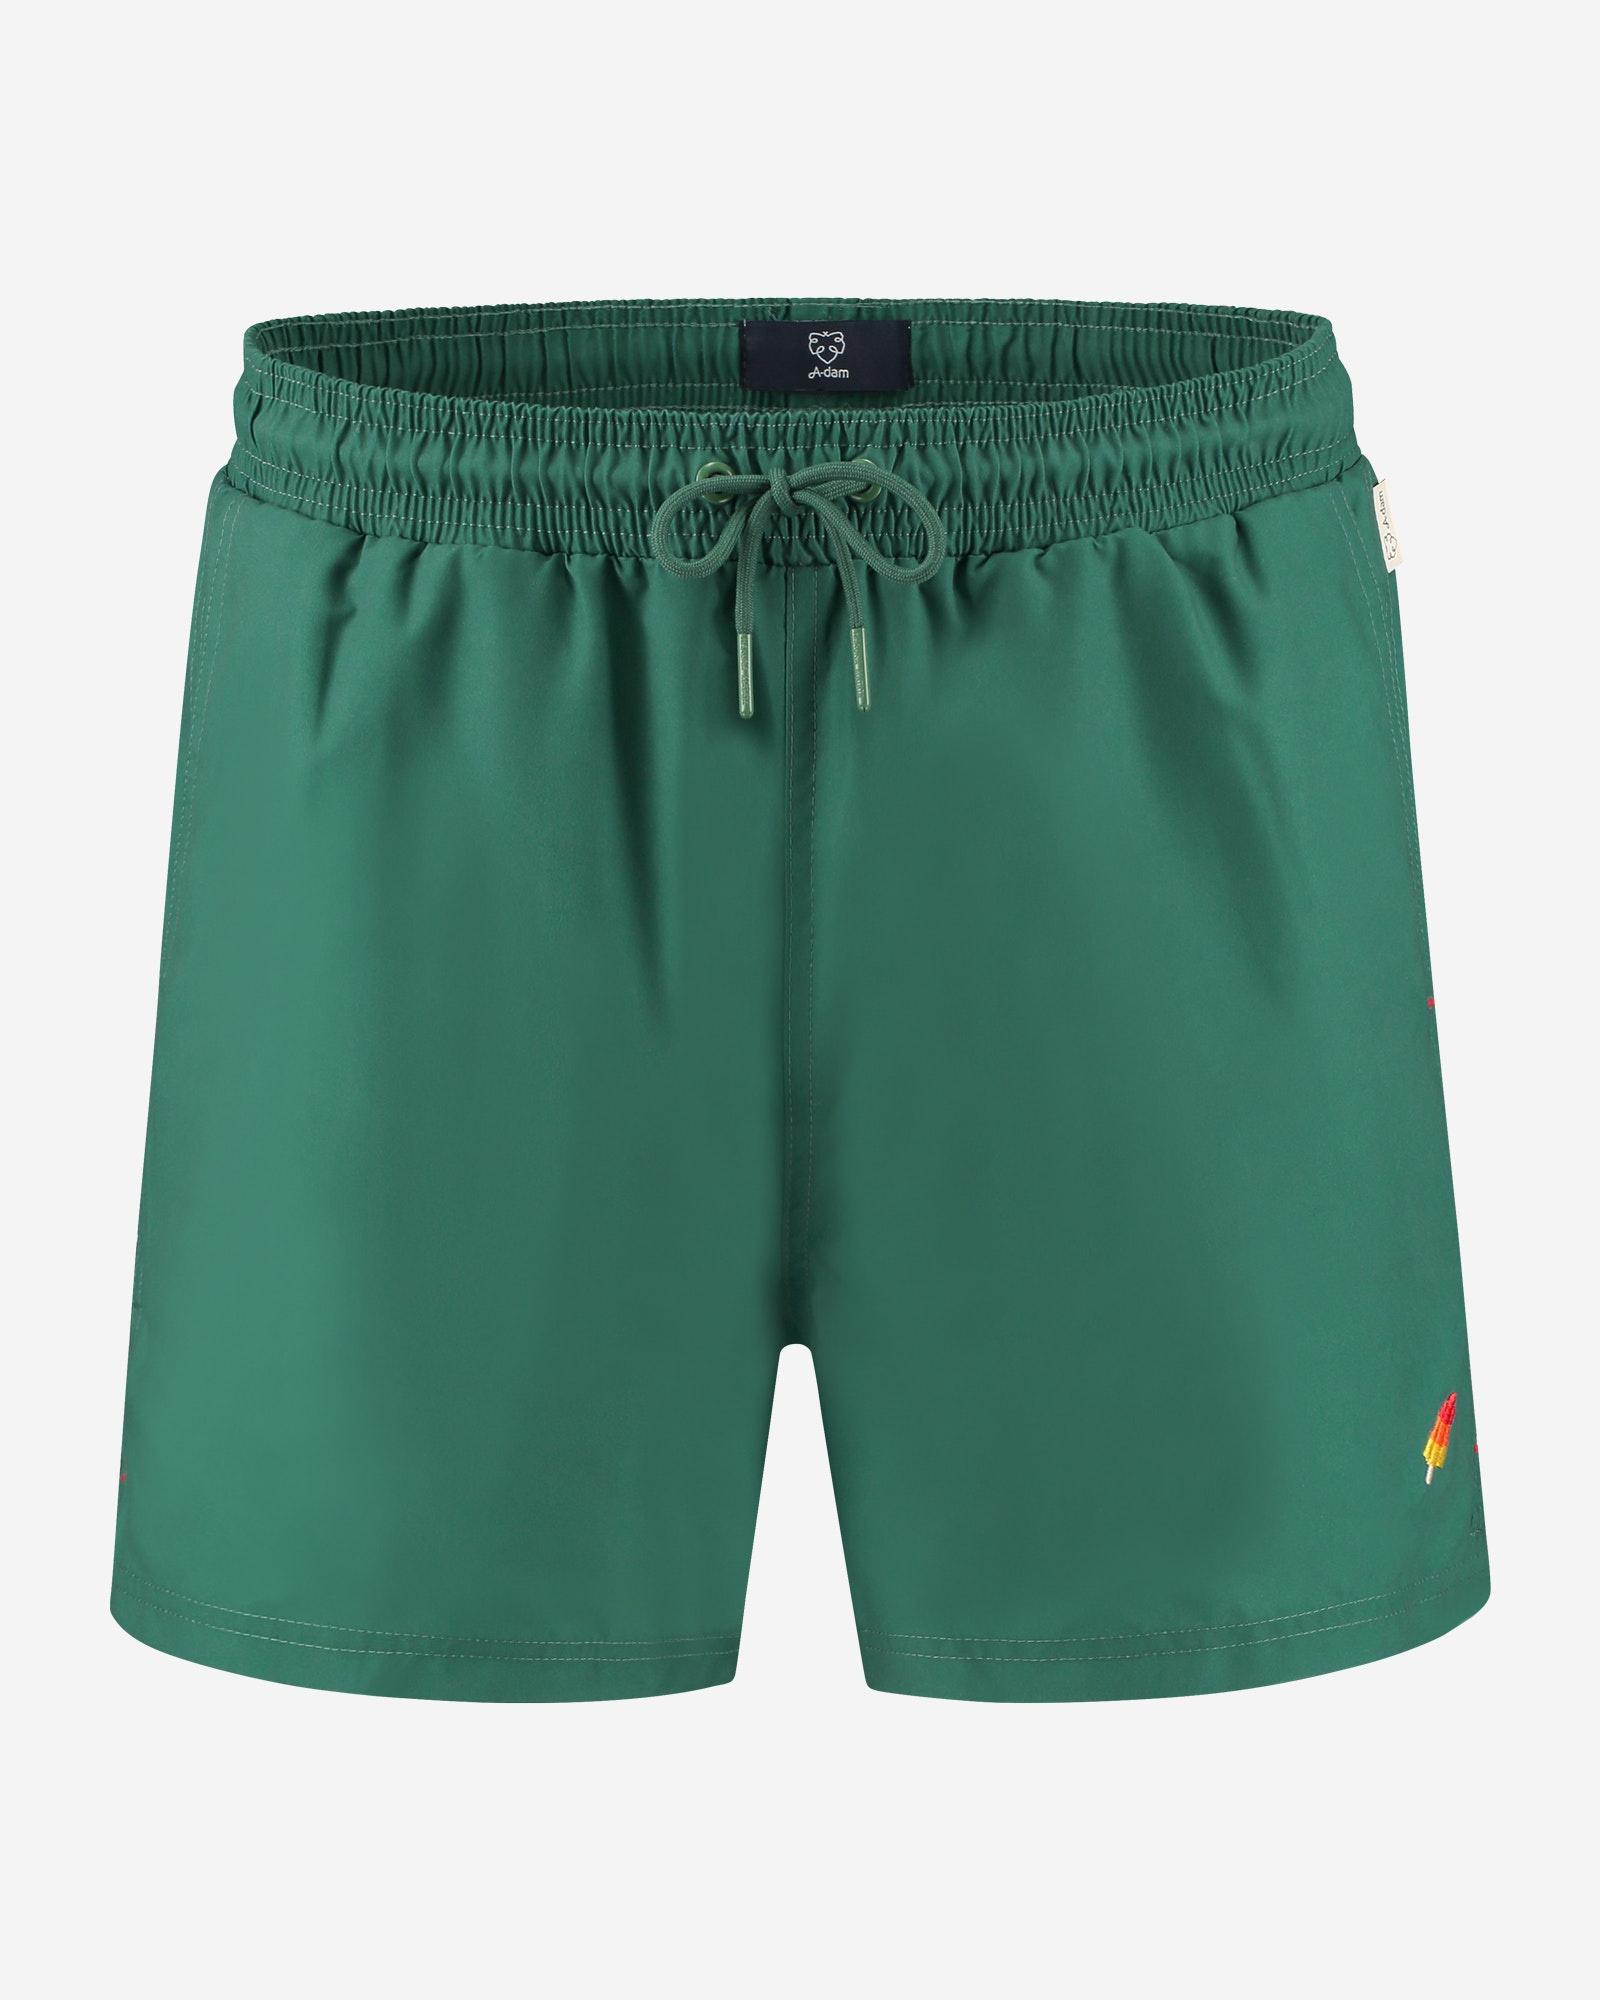 A-Dam Swimwear 1P Gino Green